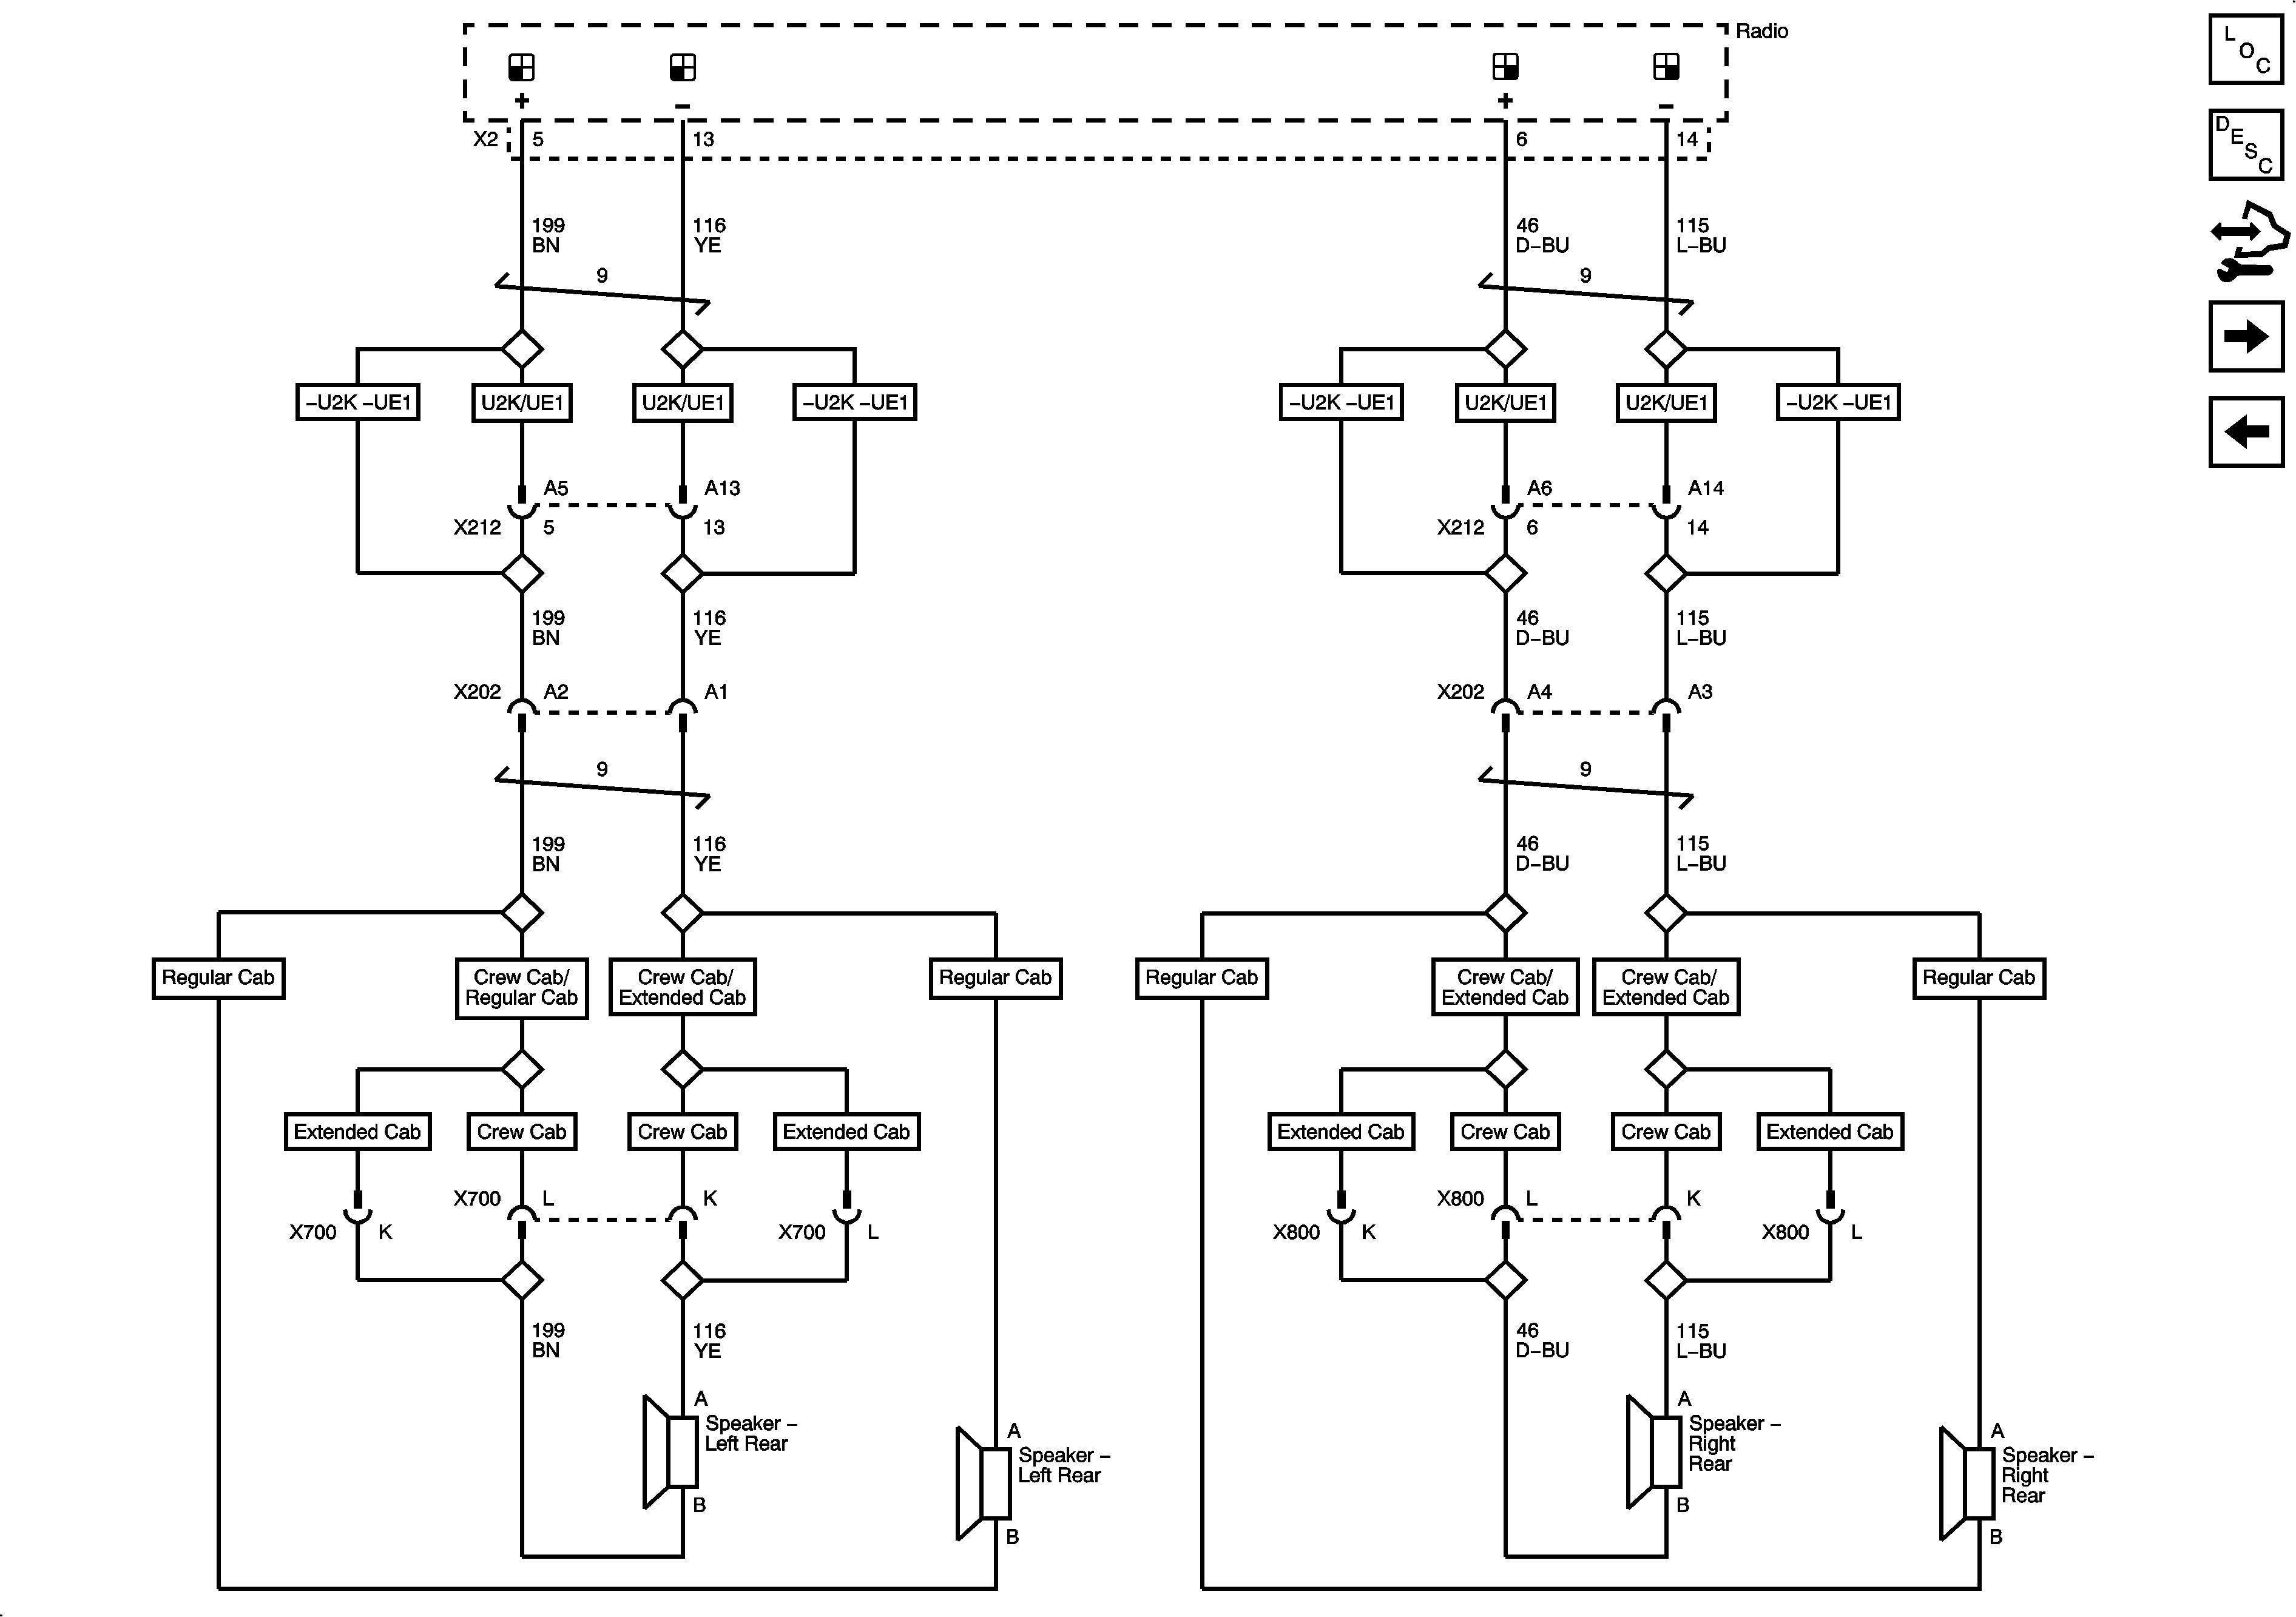 2003 impala engine wiring diagram 2003 malibu engine wiring diagram 2003 chevy malibu engine diagram my wiring diagram #12